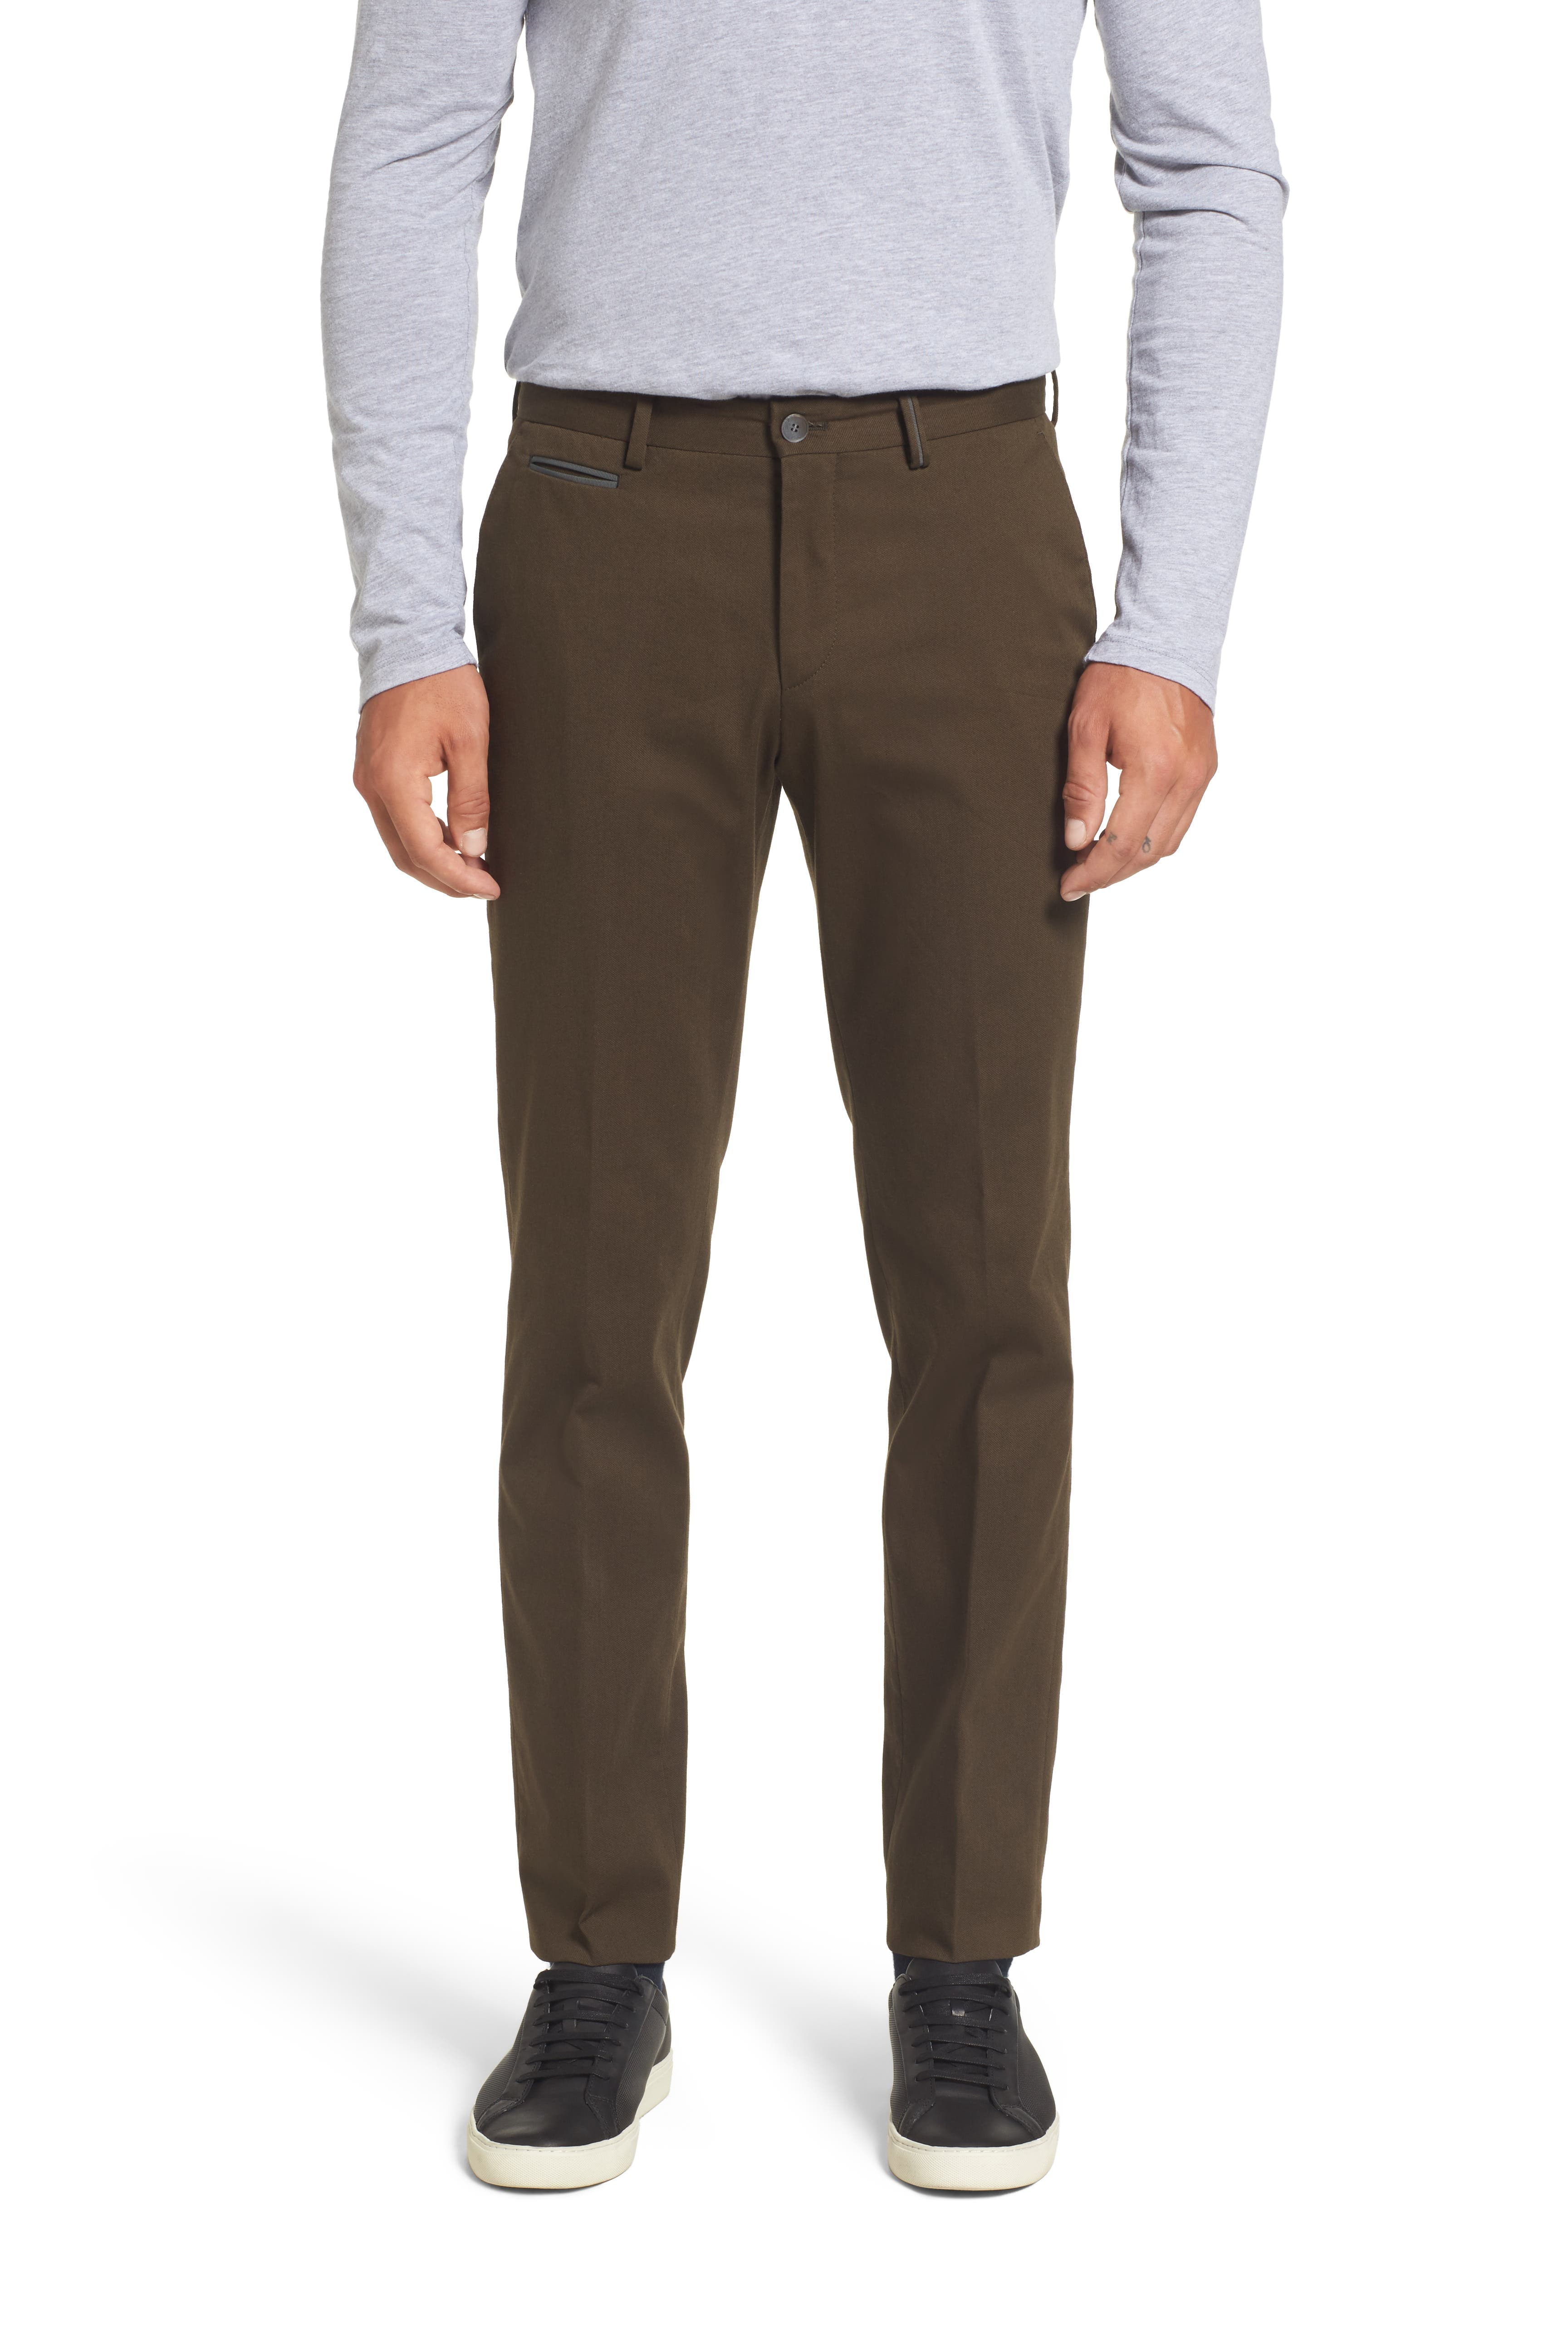 Batho-W Regular Fit Trousers,                             Main thumbnail 1, color,                             Open Green